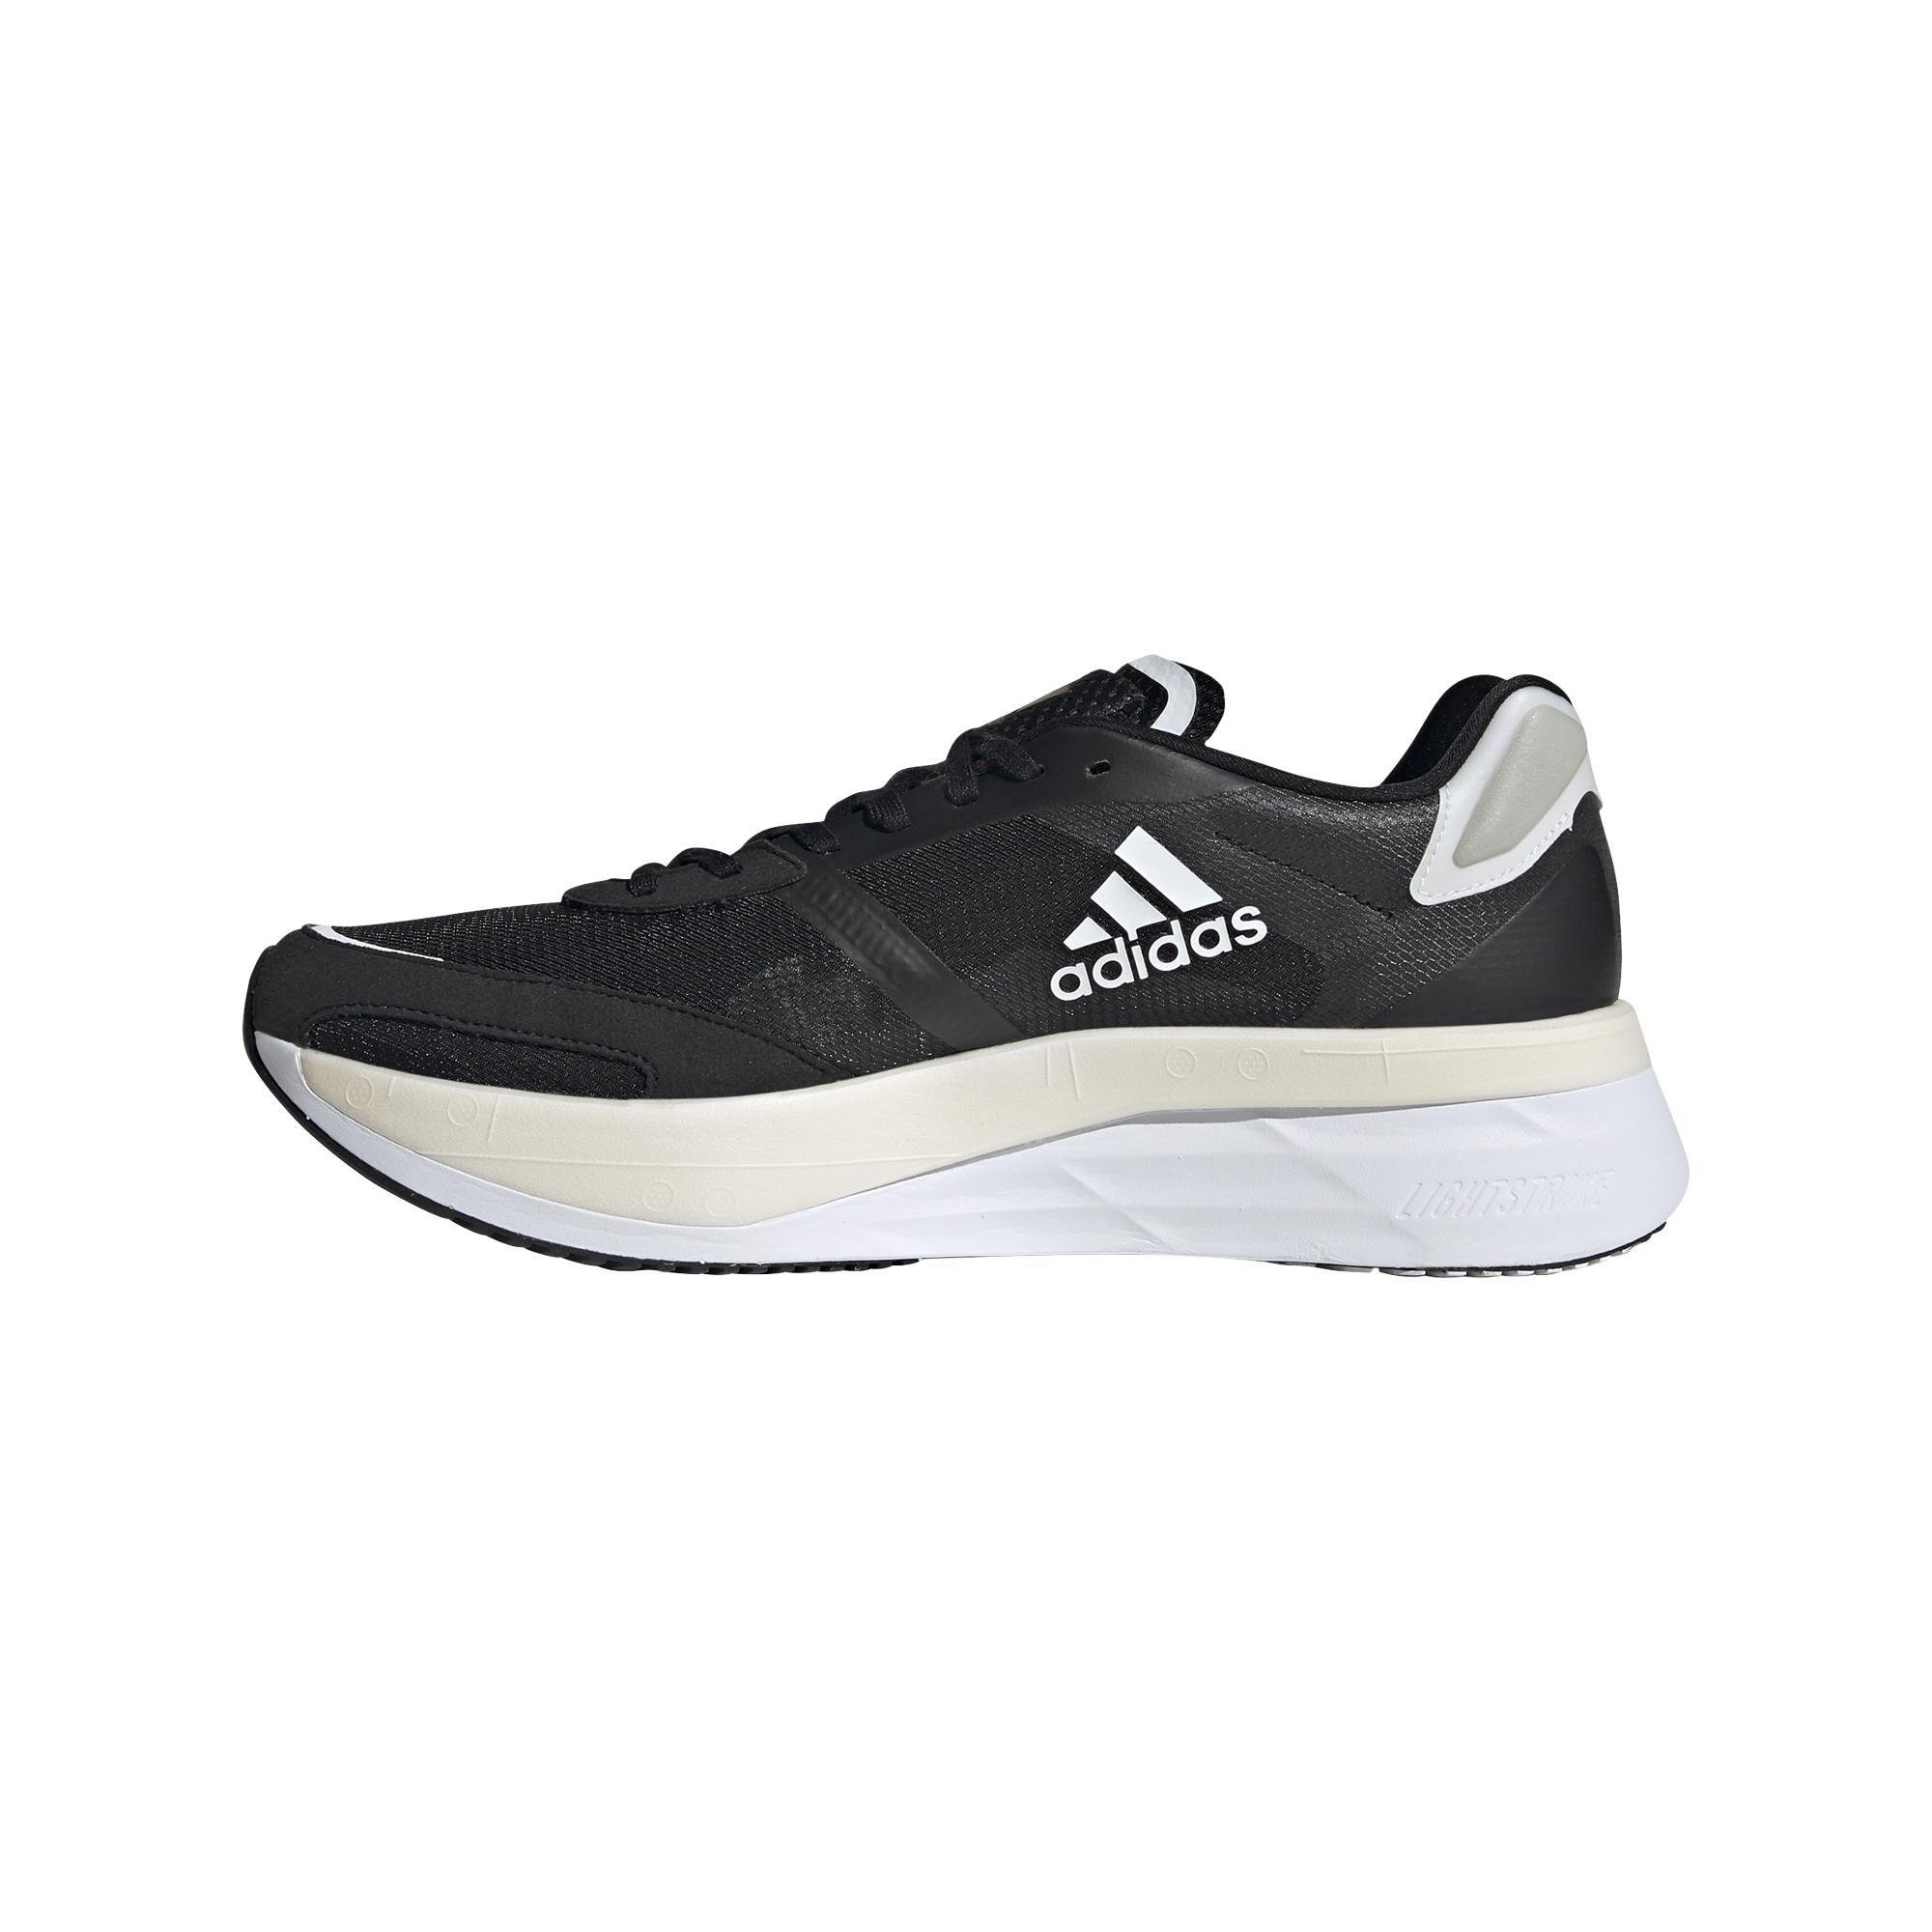 Men's Adidas Adizero Boston 10 Running Shoe - Color: Core Black / Cloud White / Gold Metallic - Size: 6.5 - Width: Regular, Core Black / Cloud White / Gold Metallic, large, image 2